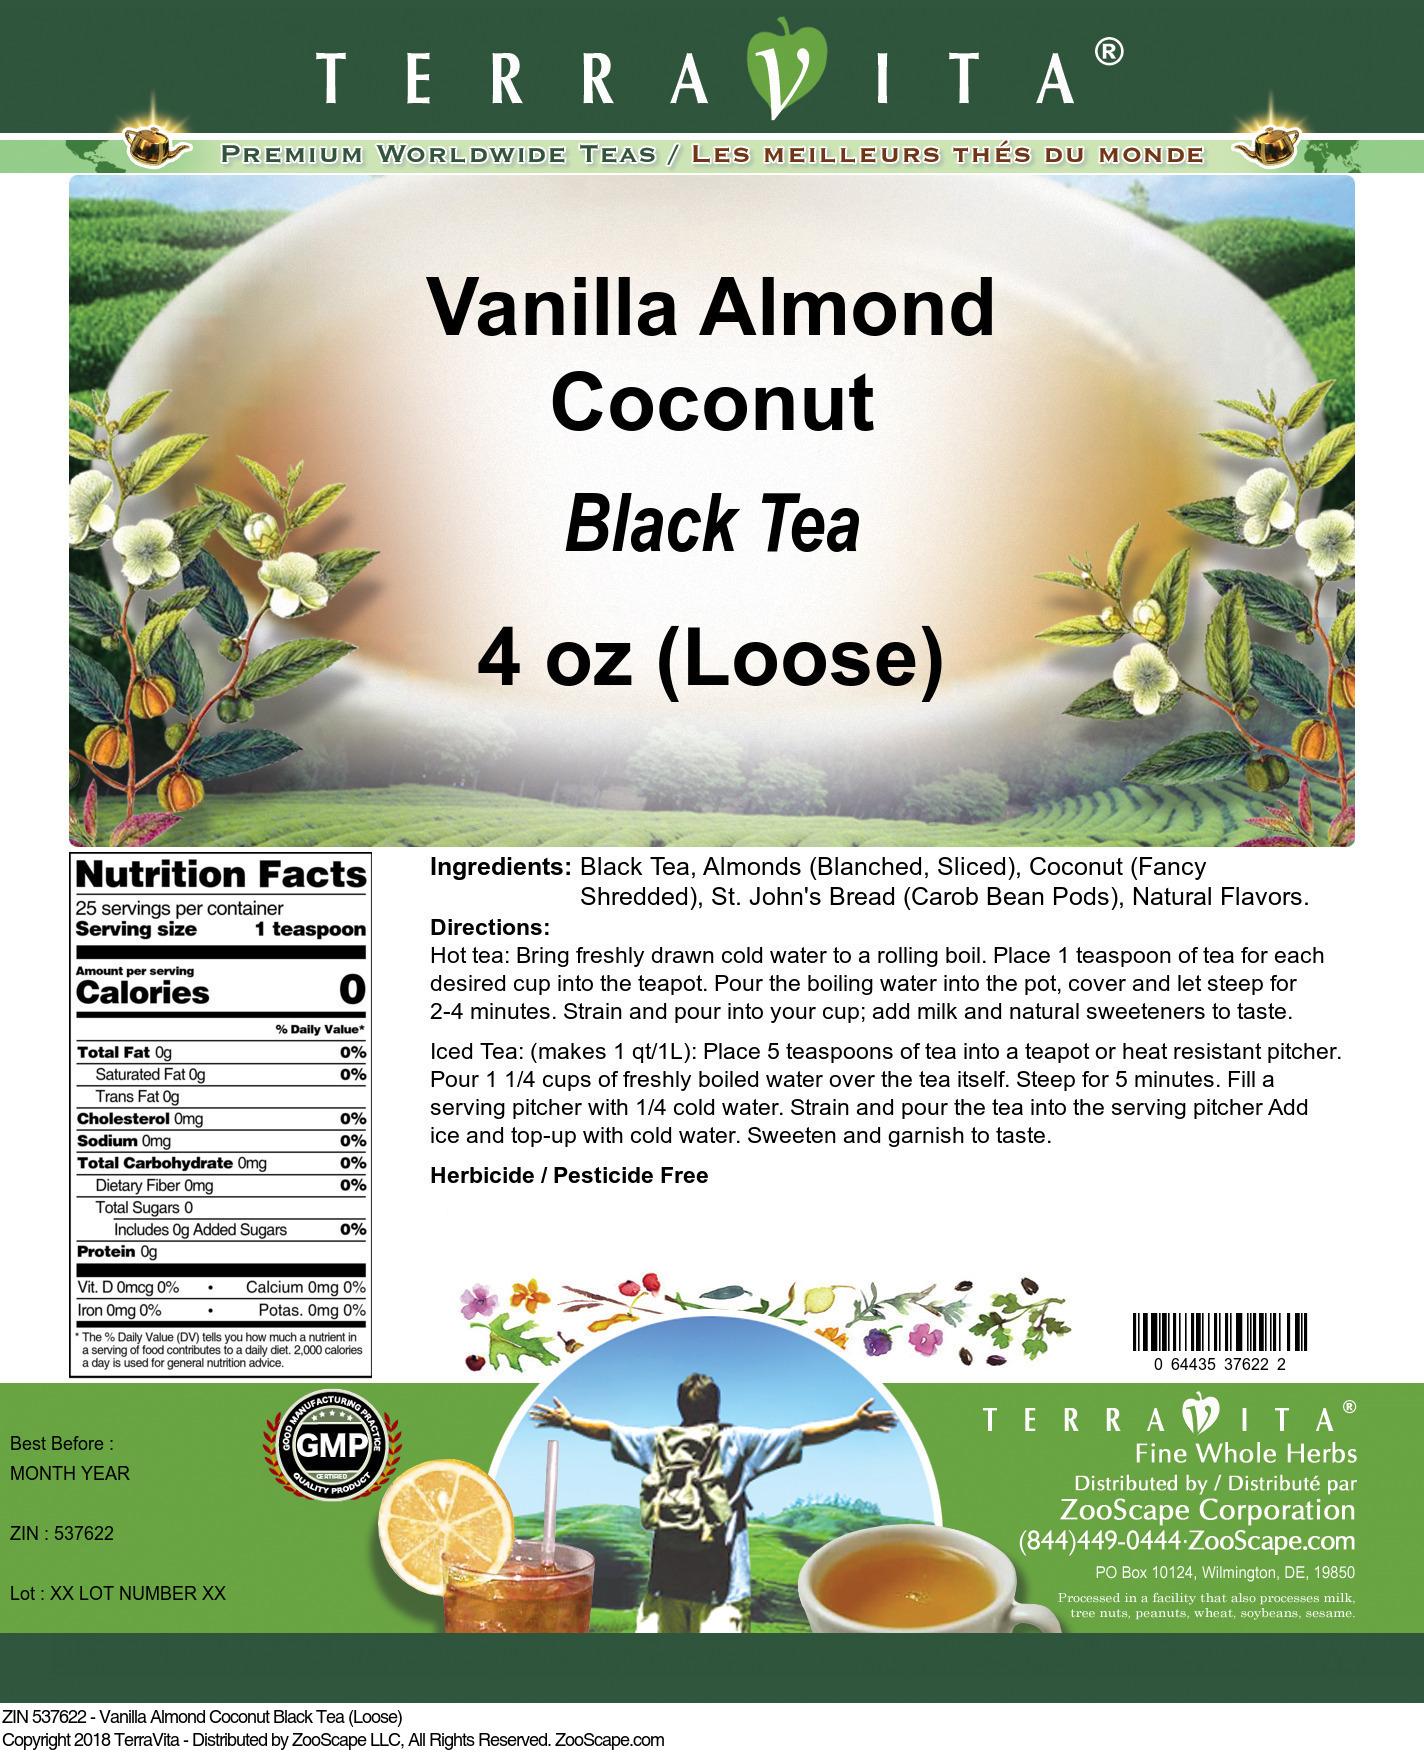 Vanilla Almond Coconut Black Tea (Loose)